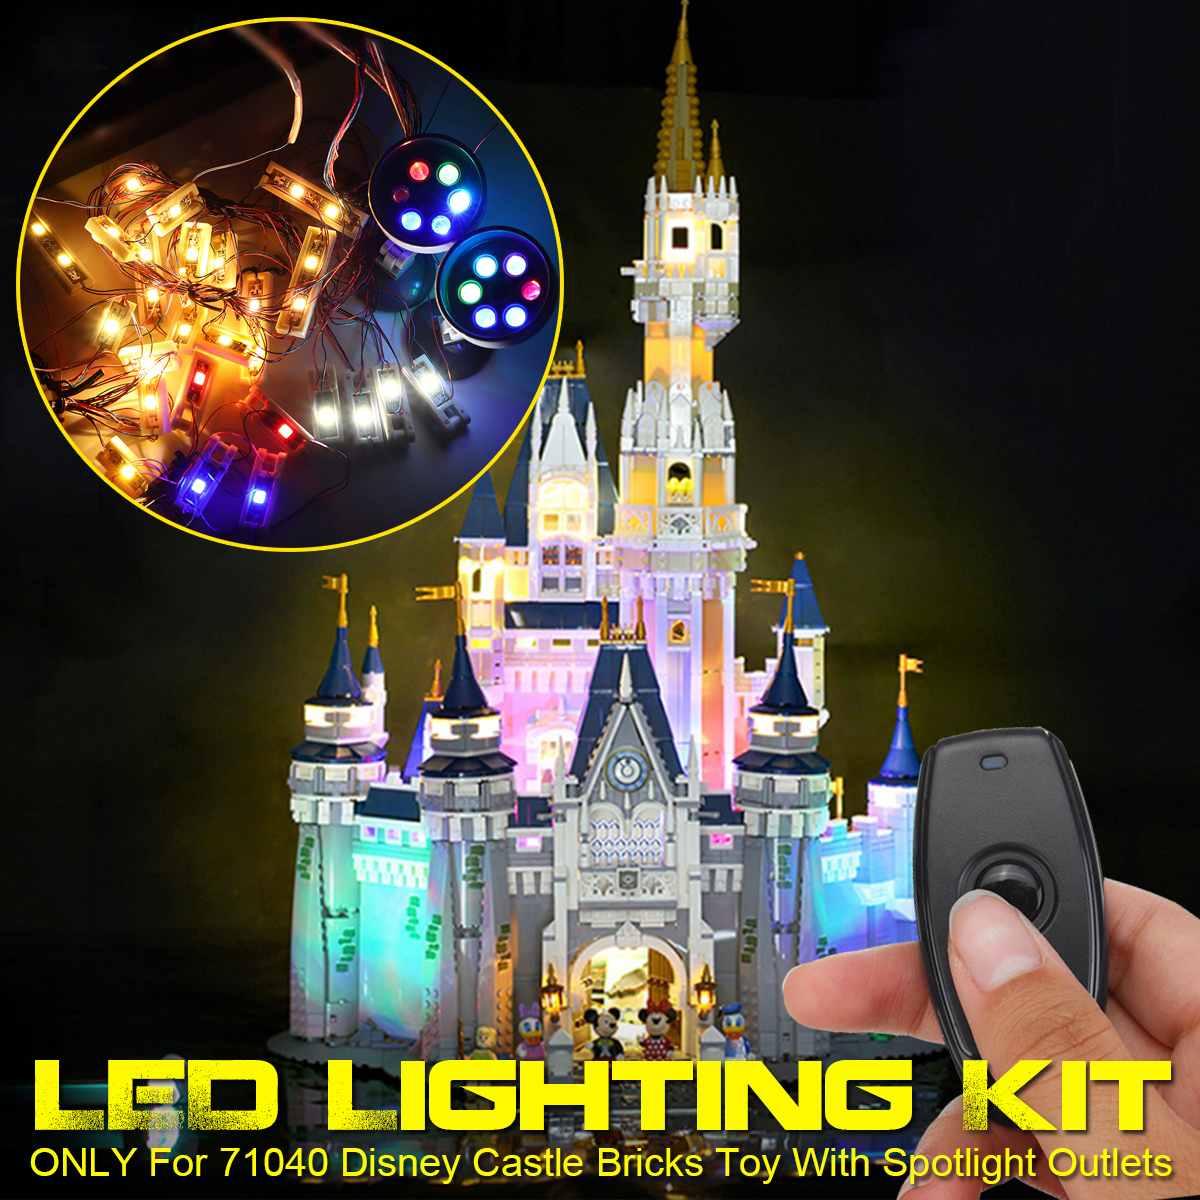 LED Lighting Kit For 71040 For Disney Castle Building Blocks Bricks (Only Lighting Set Included) With Remote Control Outlet